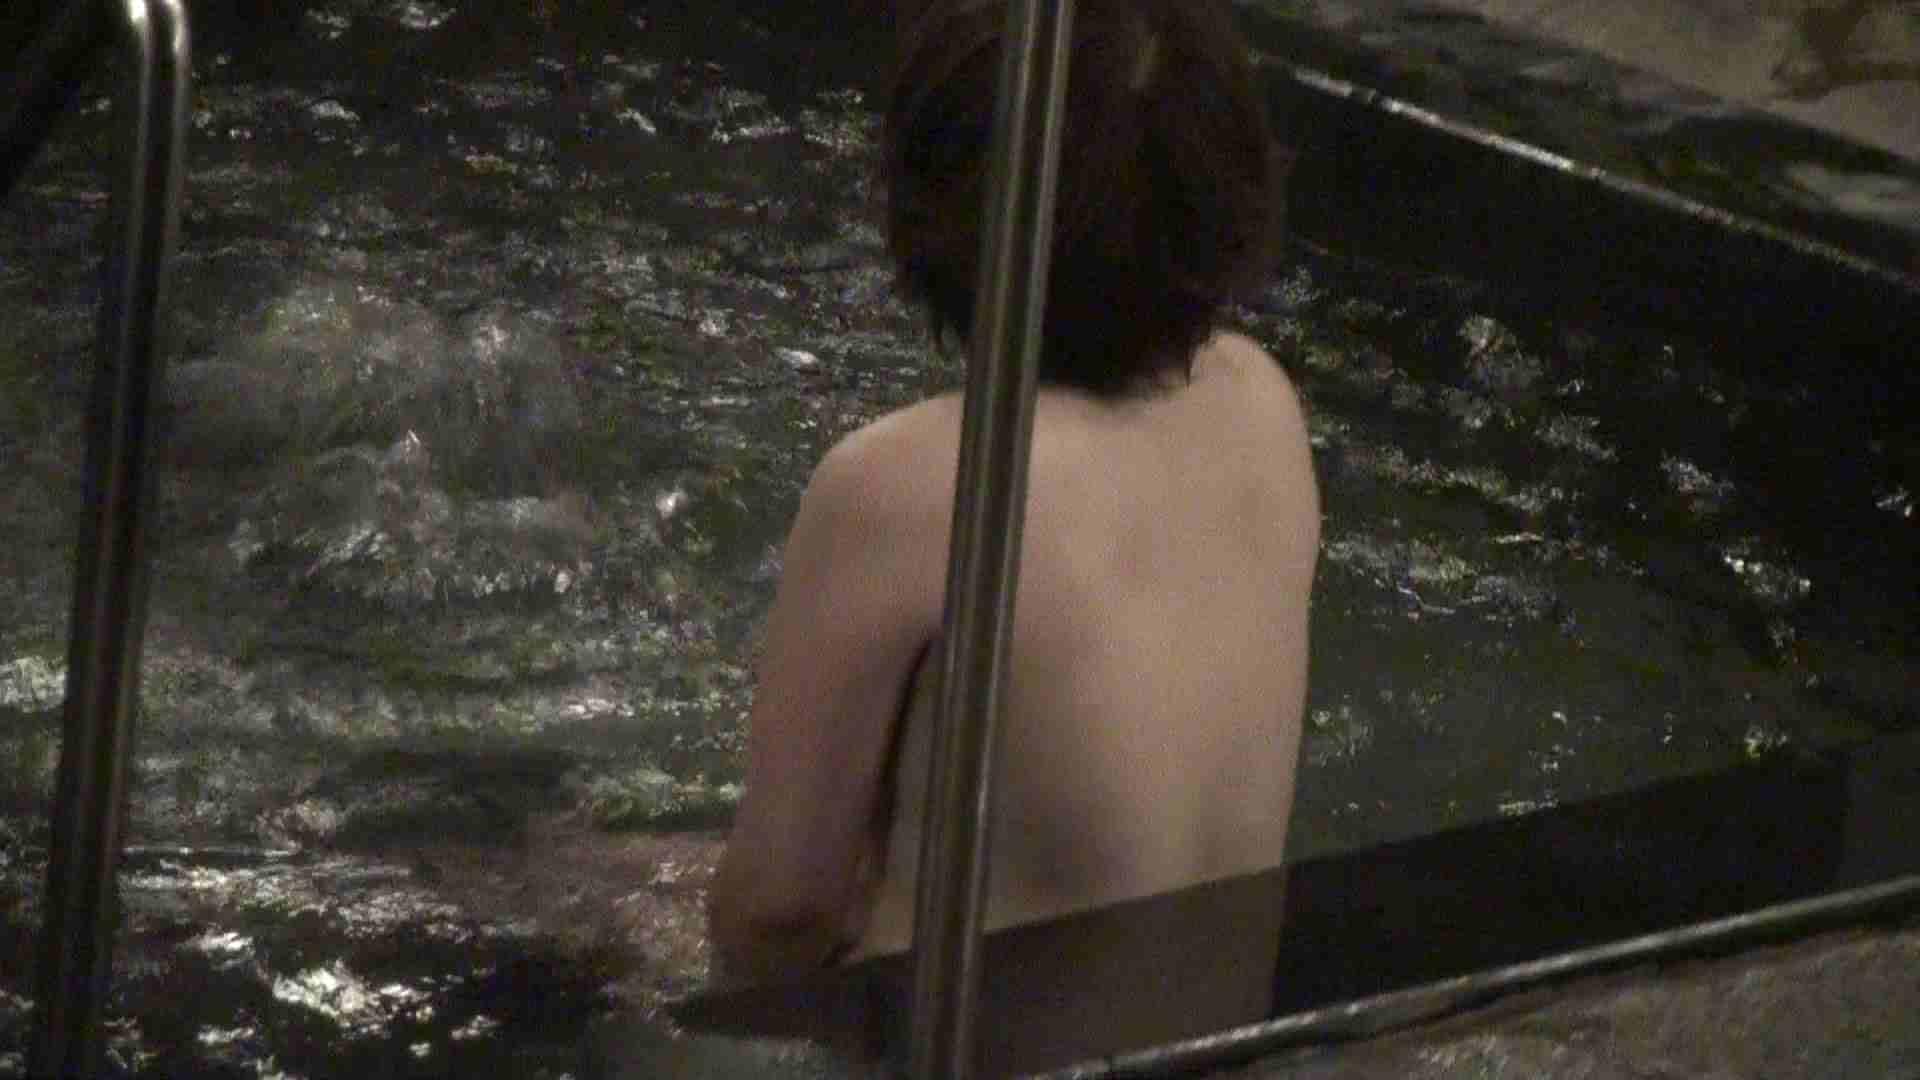 Aquaな露天風呂Vol.432 盗撮 エロ無料画像 73連発 29